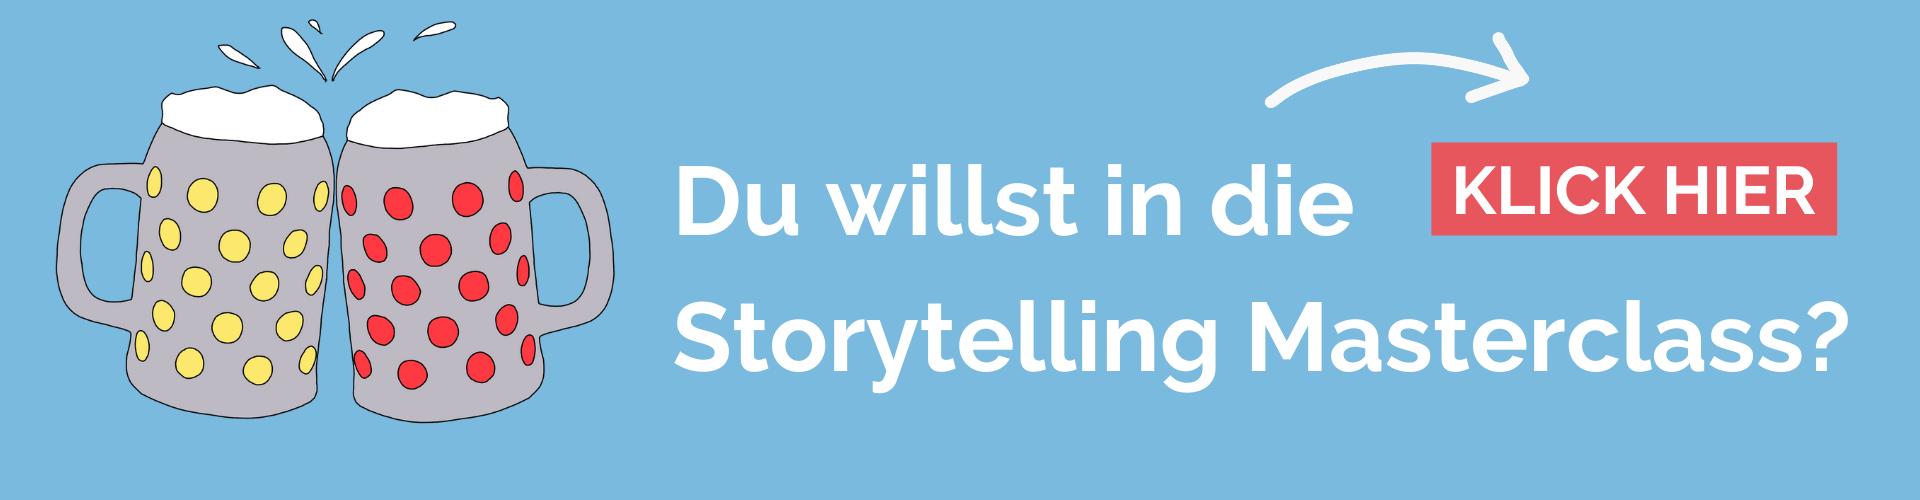 Storytelling Masterclass Brauerei